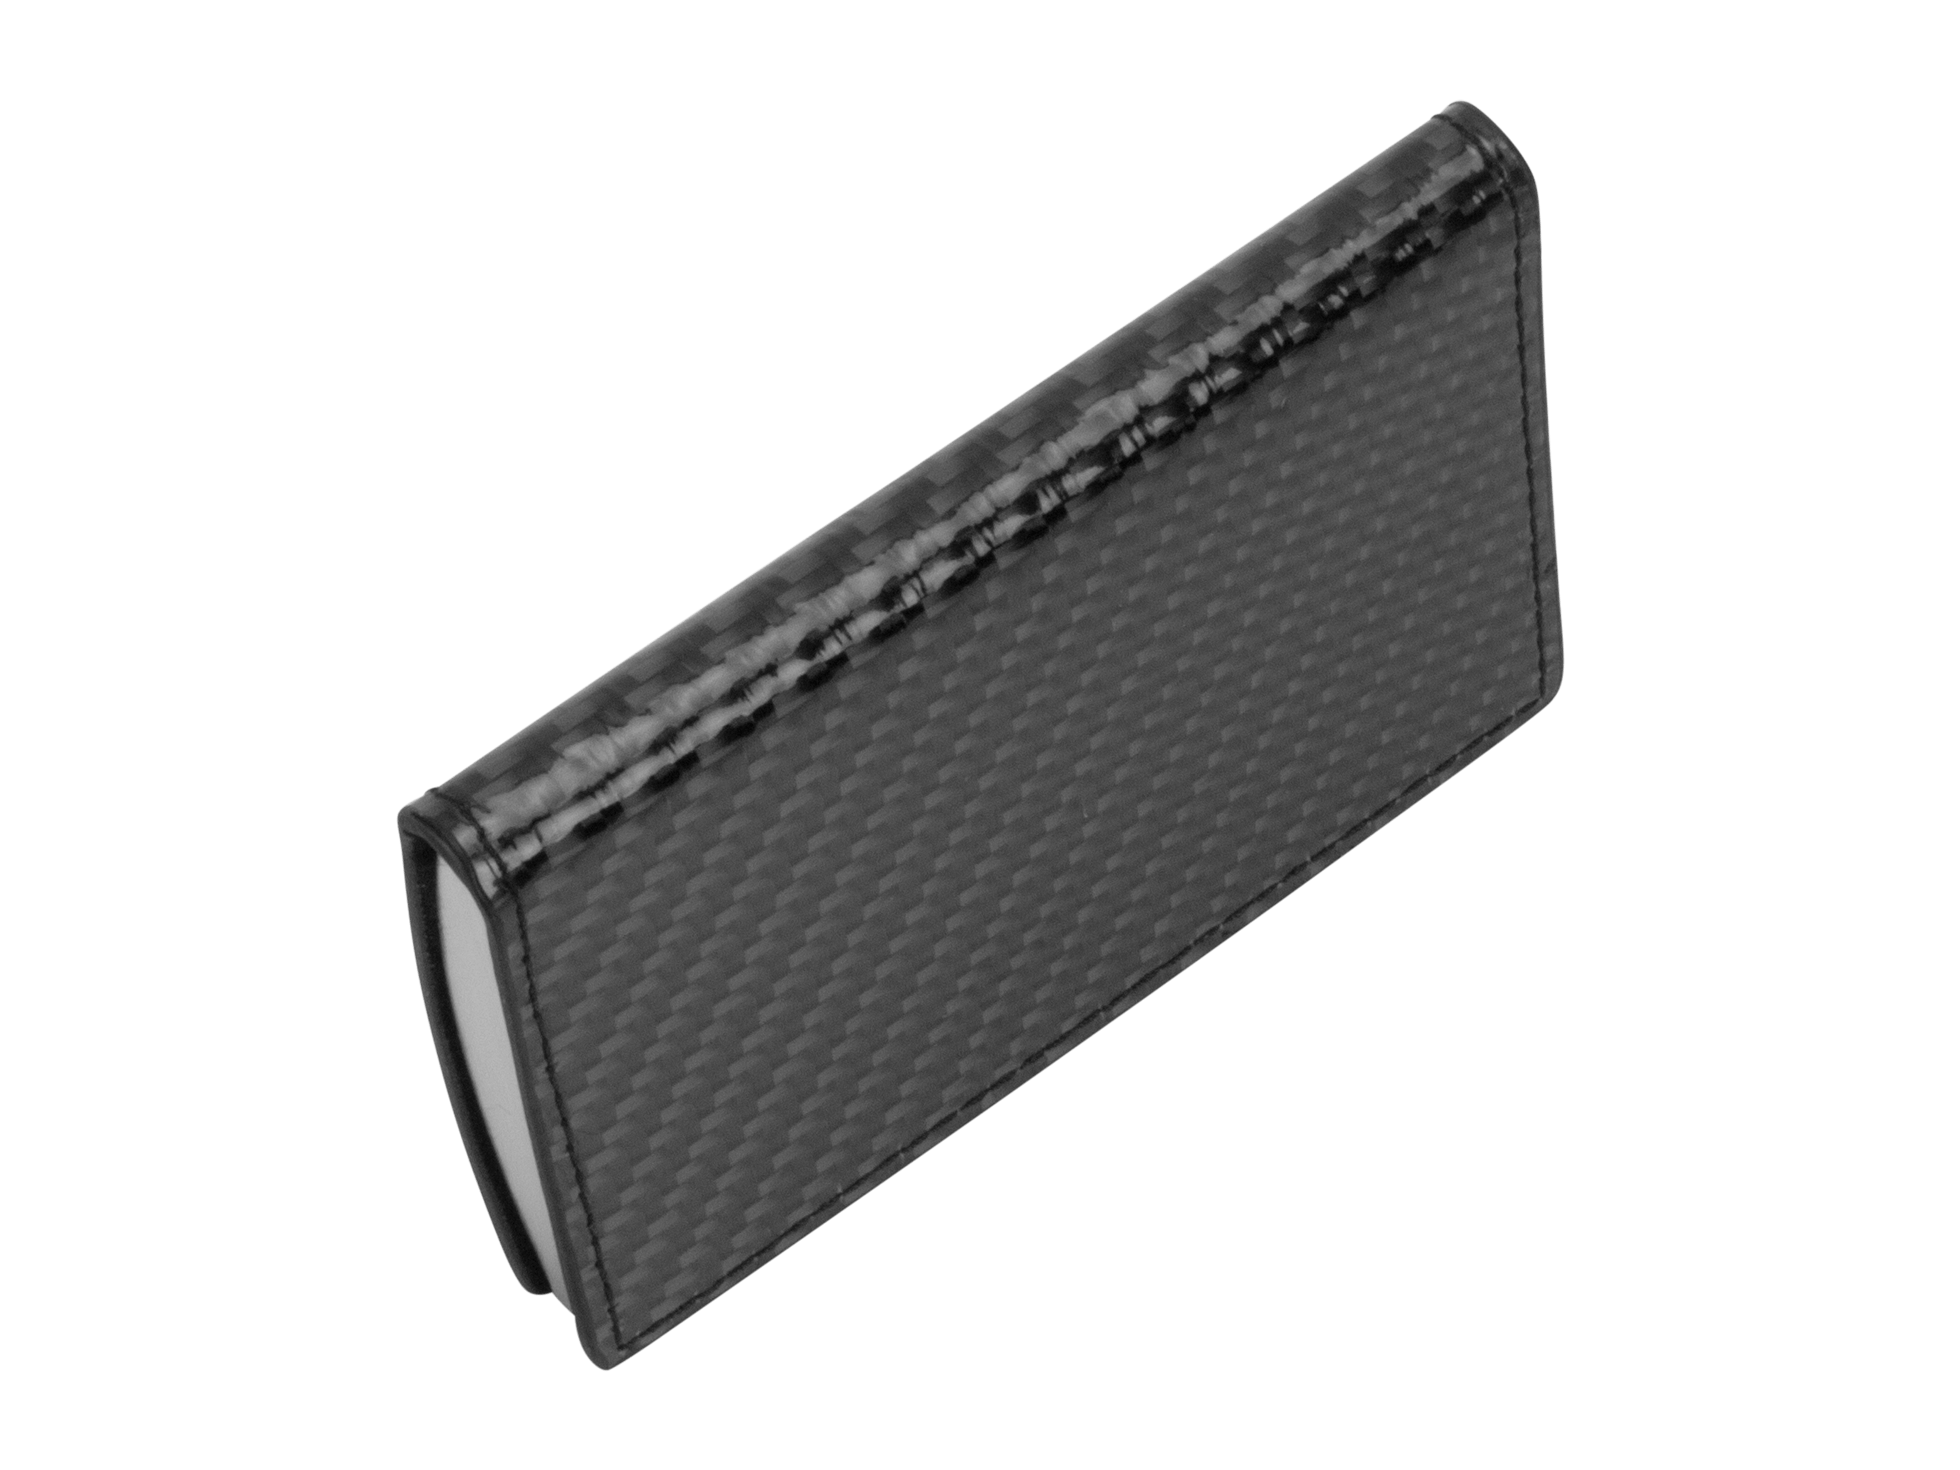 clip free Flexy Carbon Fiber Business Card Holder